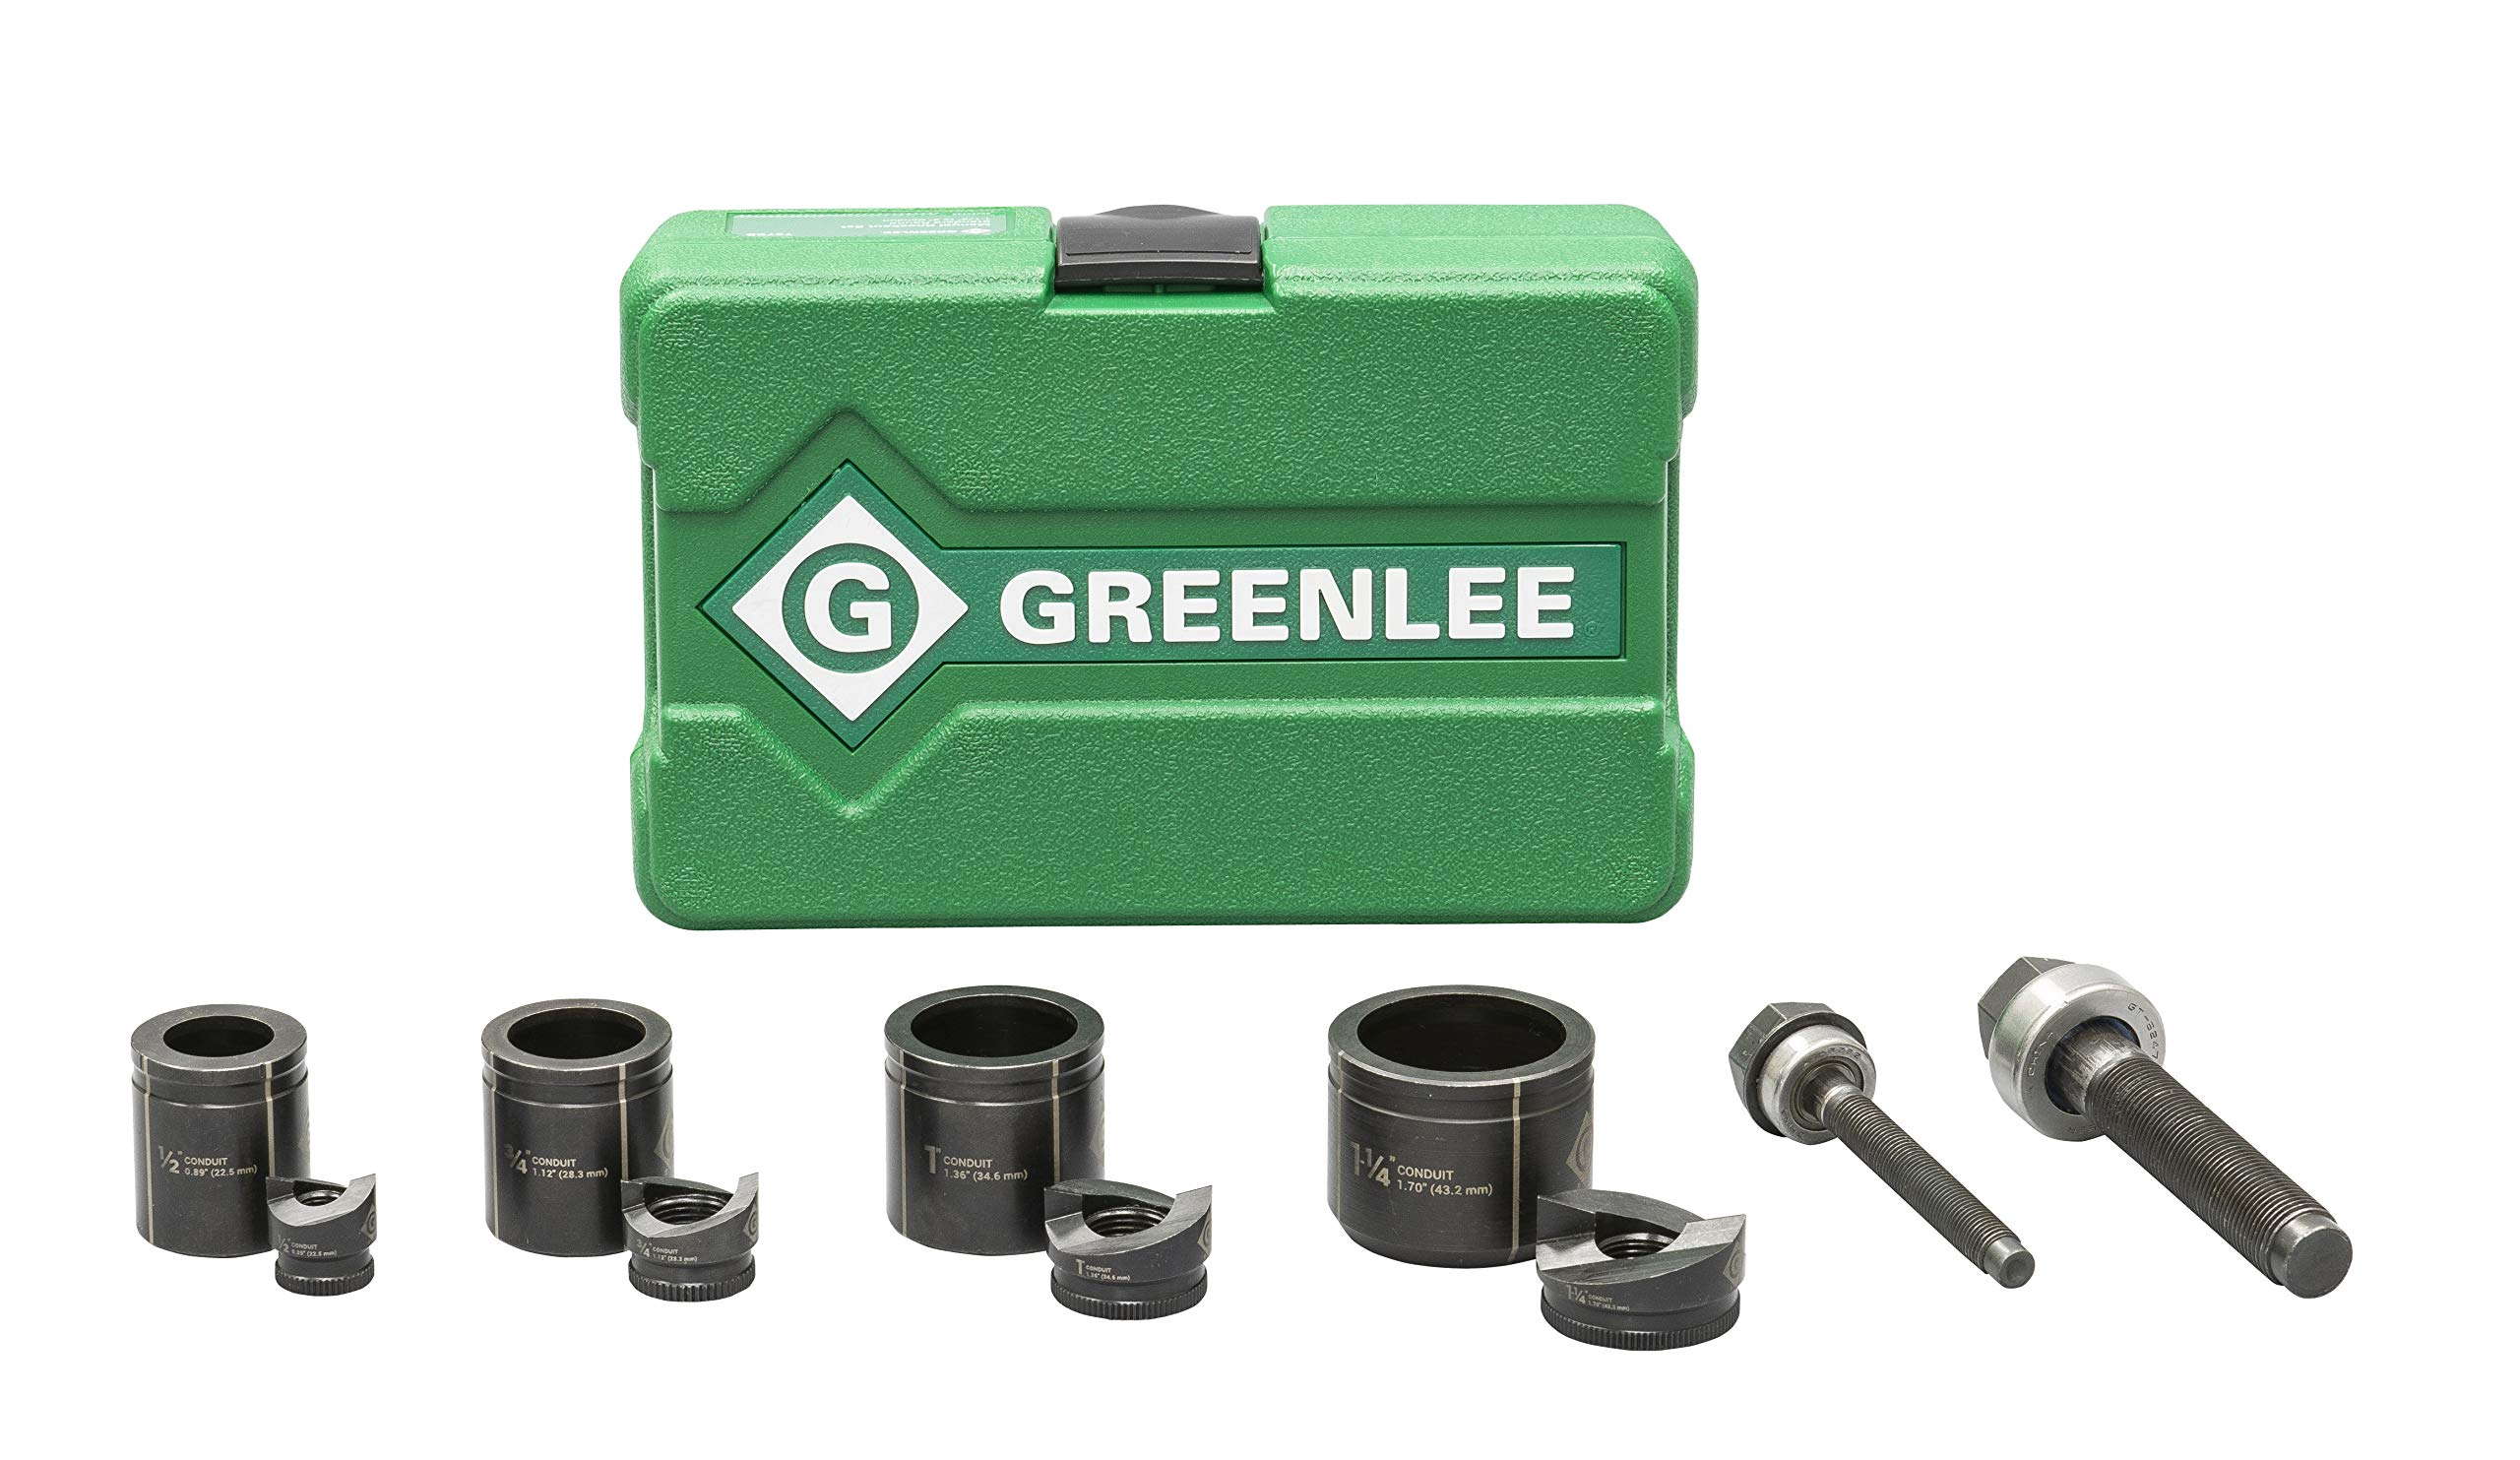 Hole Punch Set, 10 Piece, 10, 12 ga. Steel by Greenlee